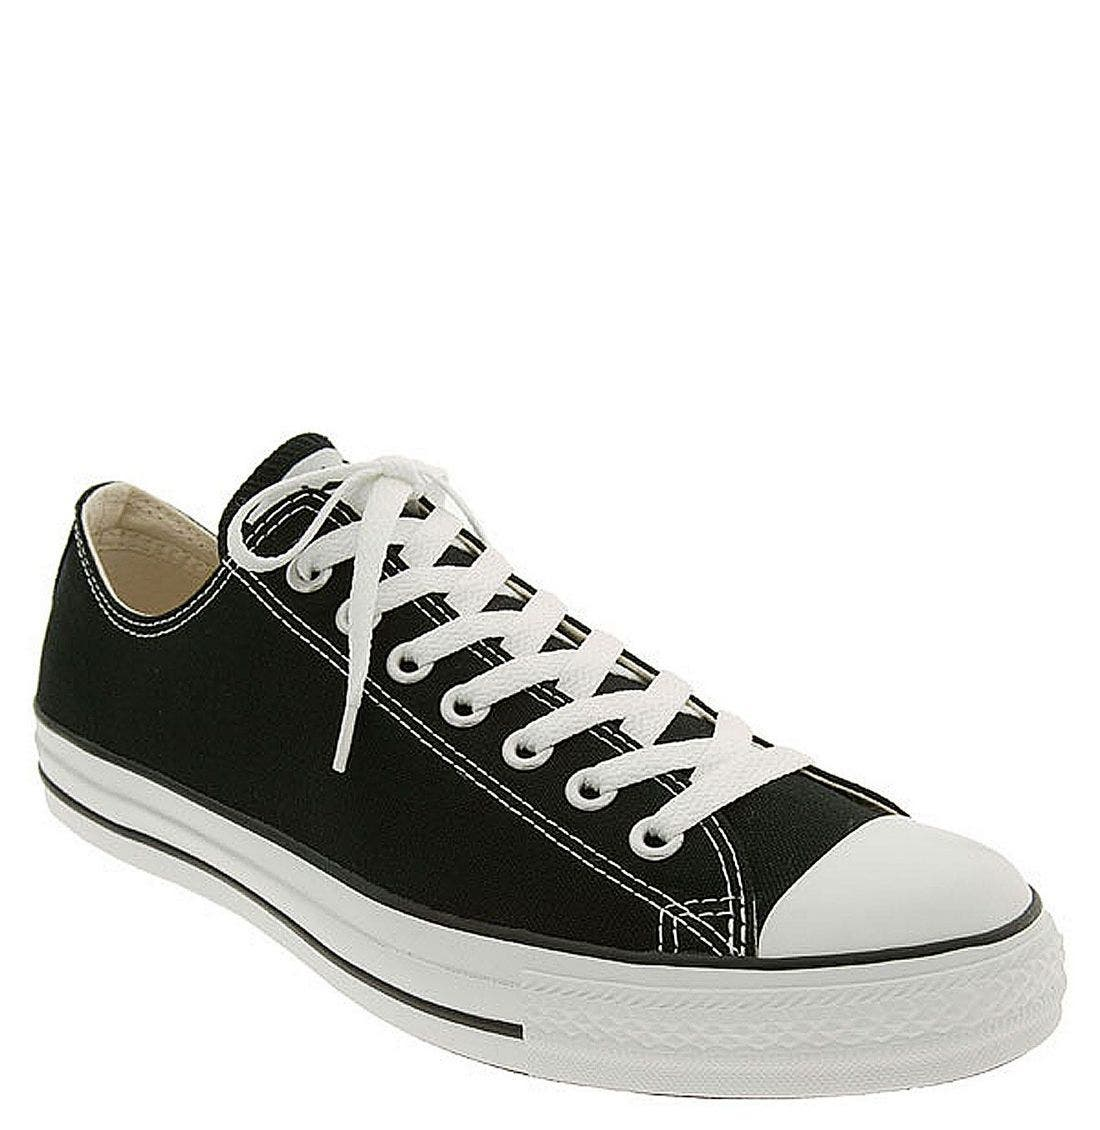 Converse Chuck Taylor Low Top Sneaker- White